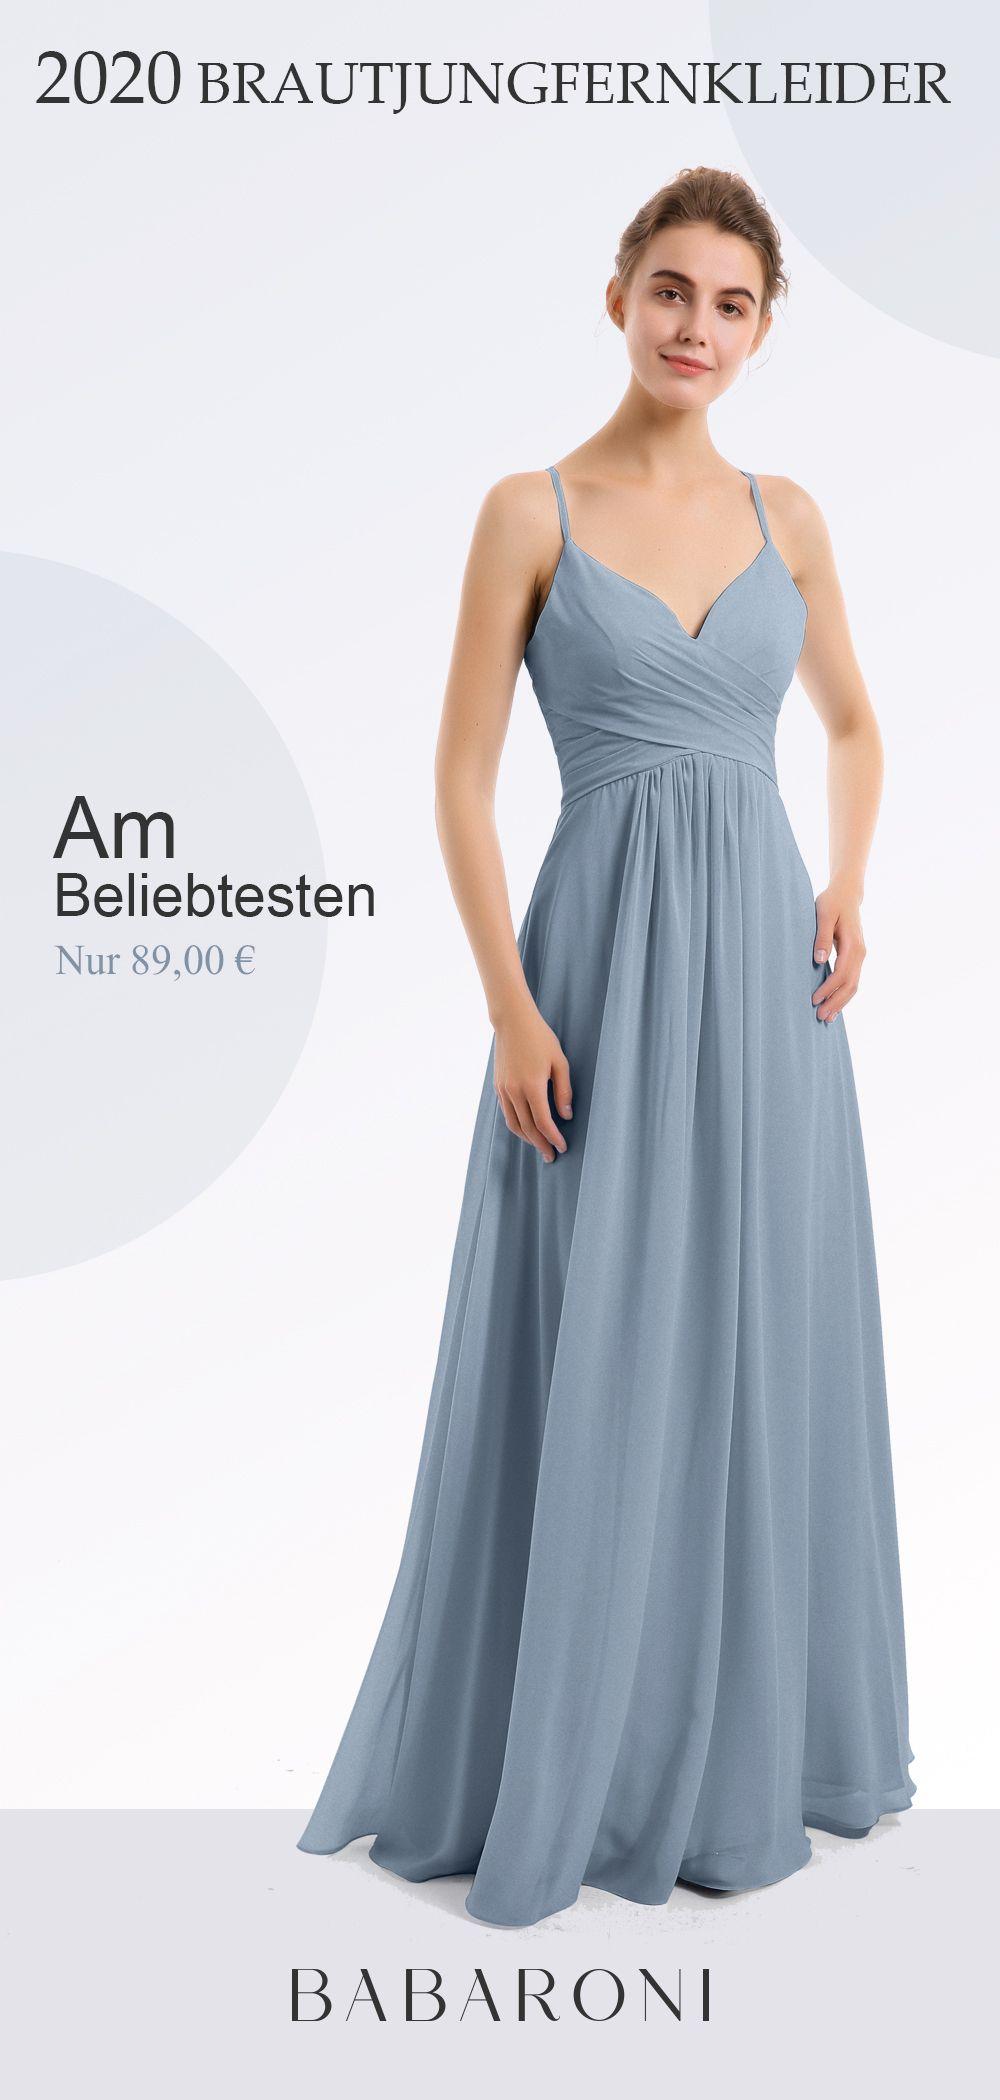 Babaroni Tammy  Chiffon kleid, Kleider, Modestil